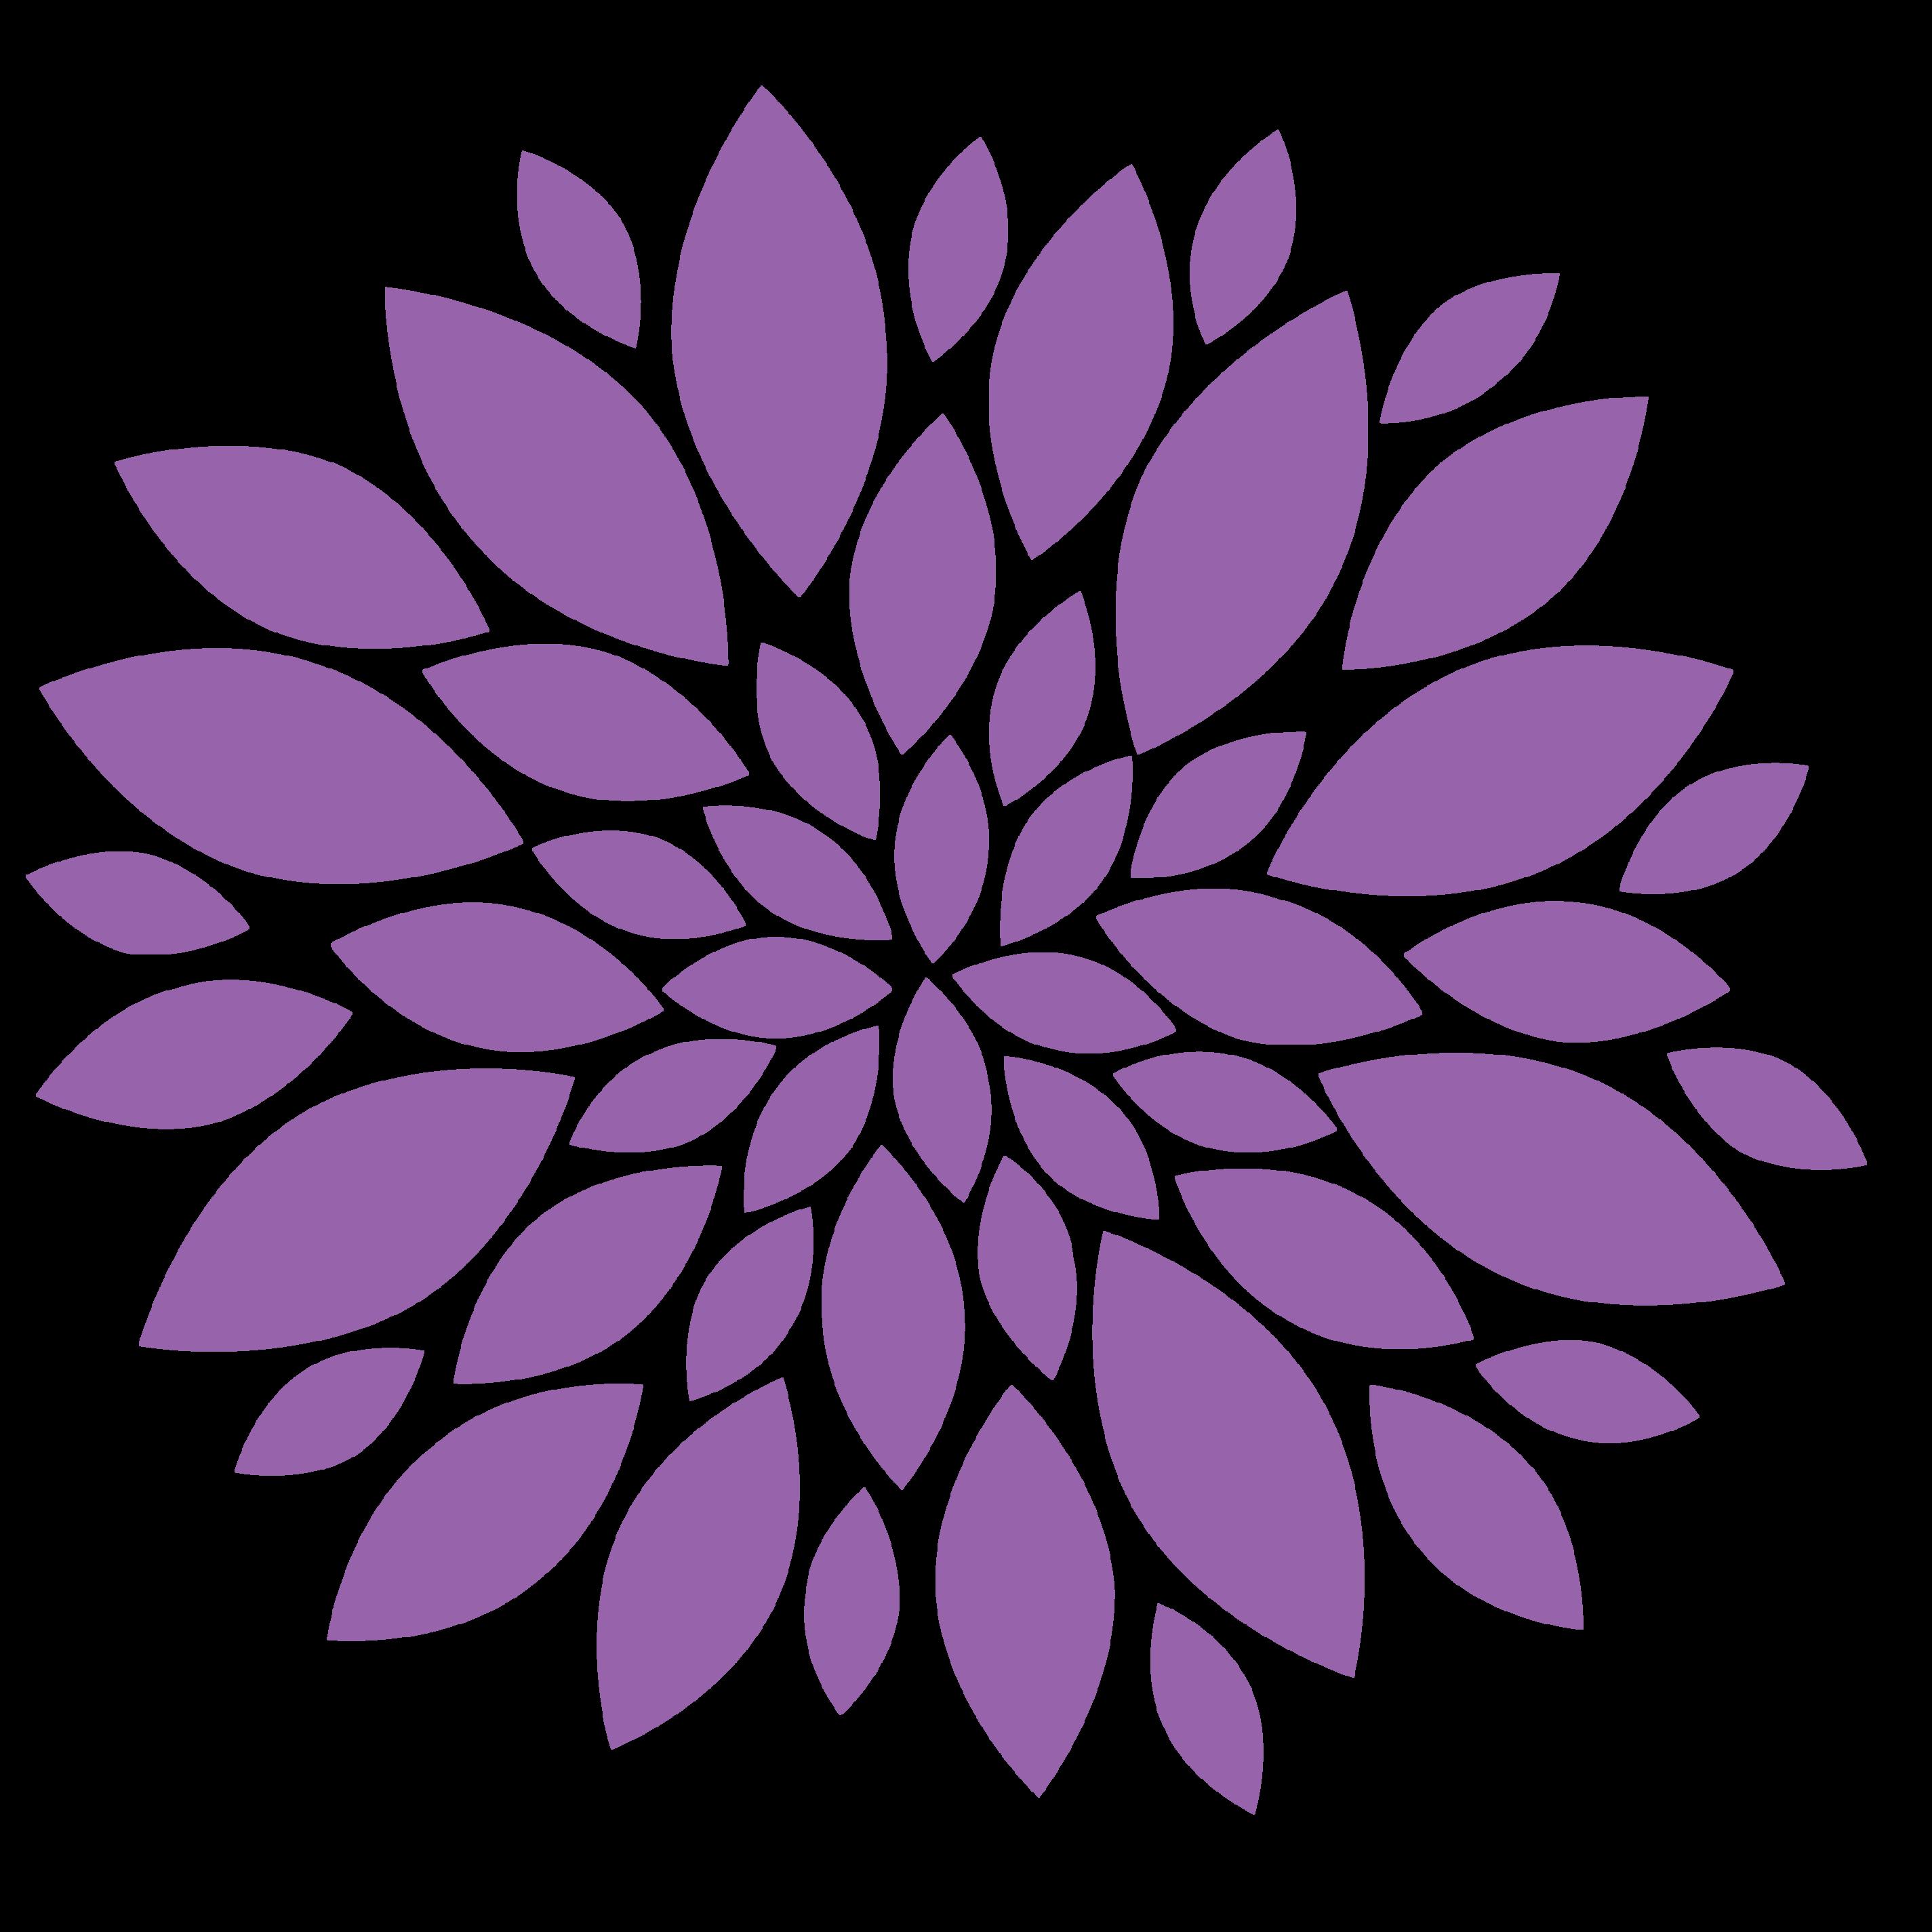 Dark purple heart clipart picture free download Clip art purple flower - ClipartFest picture free download